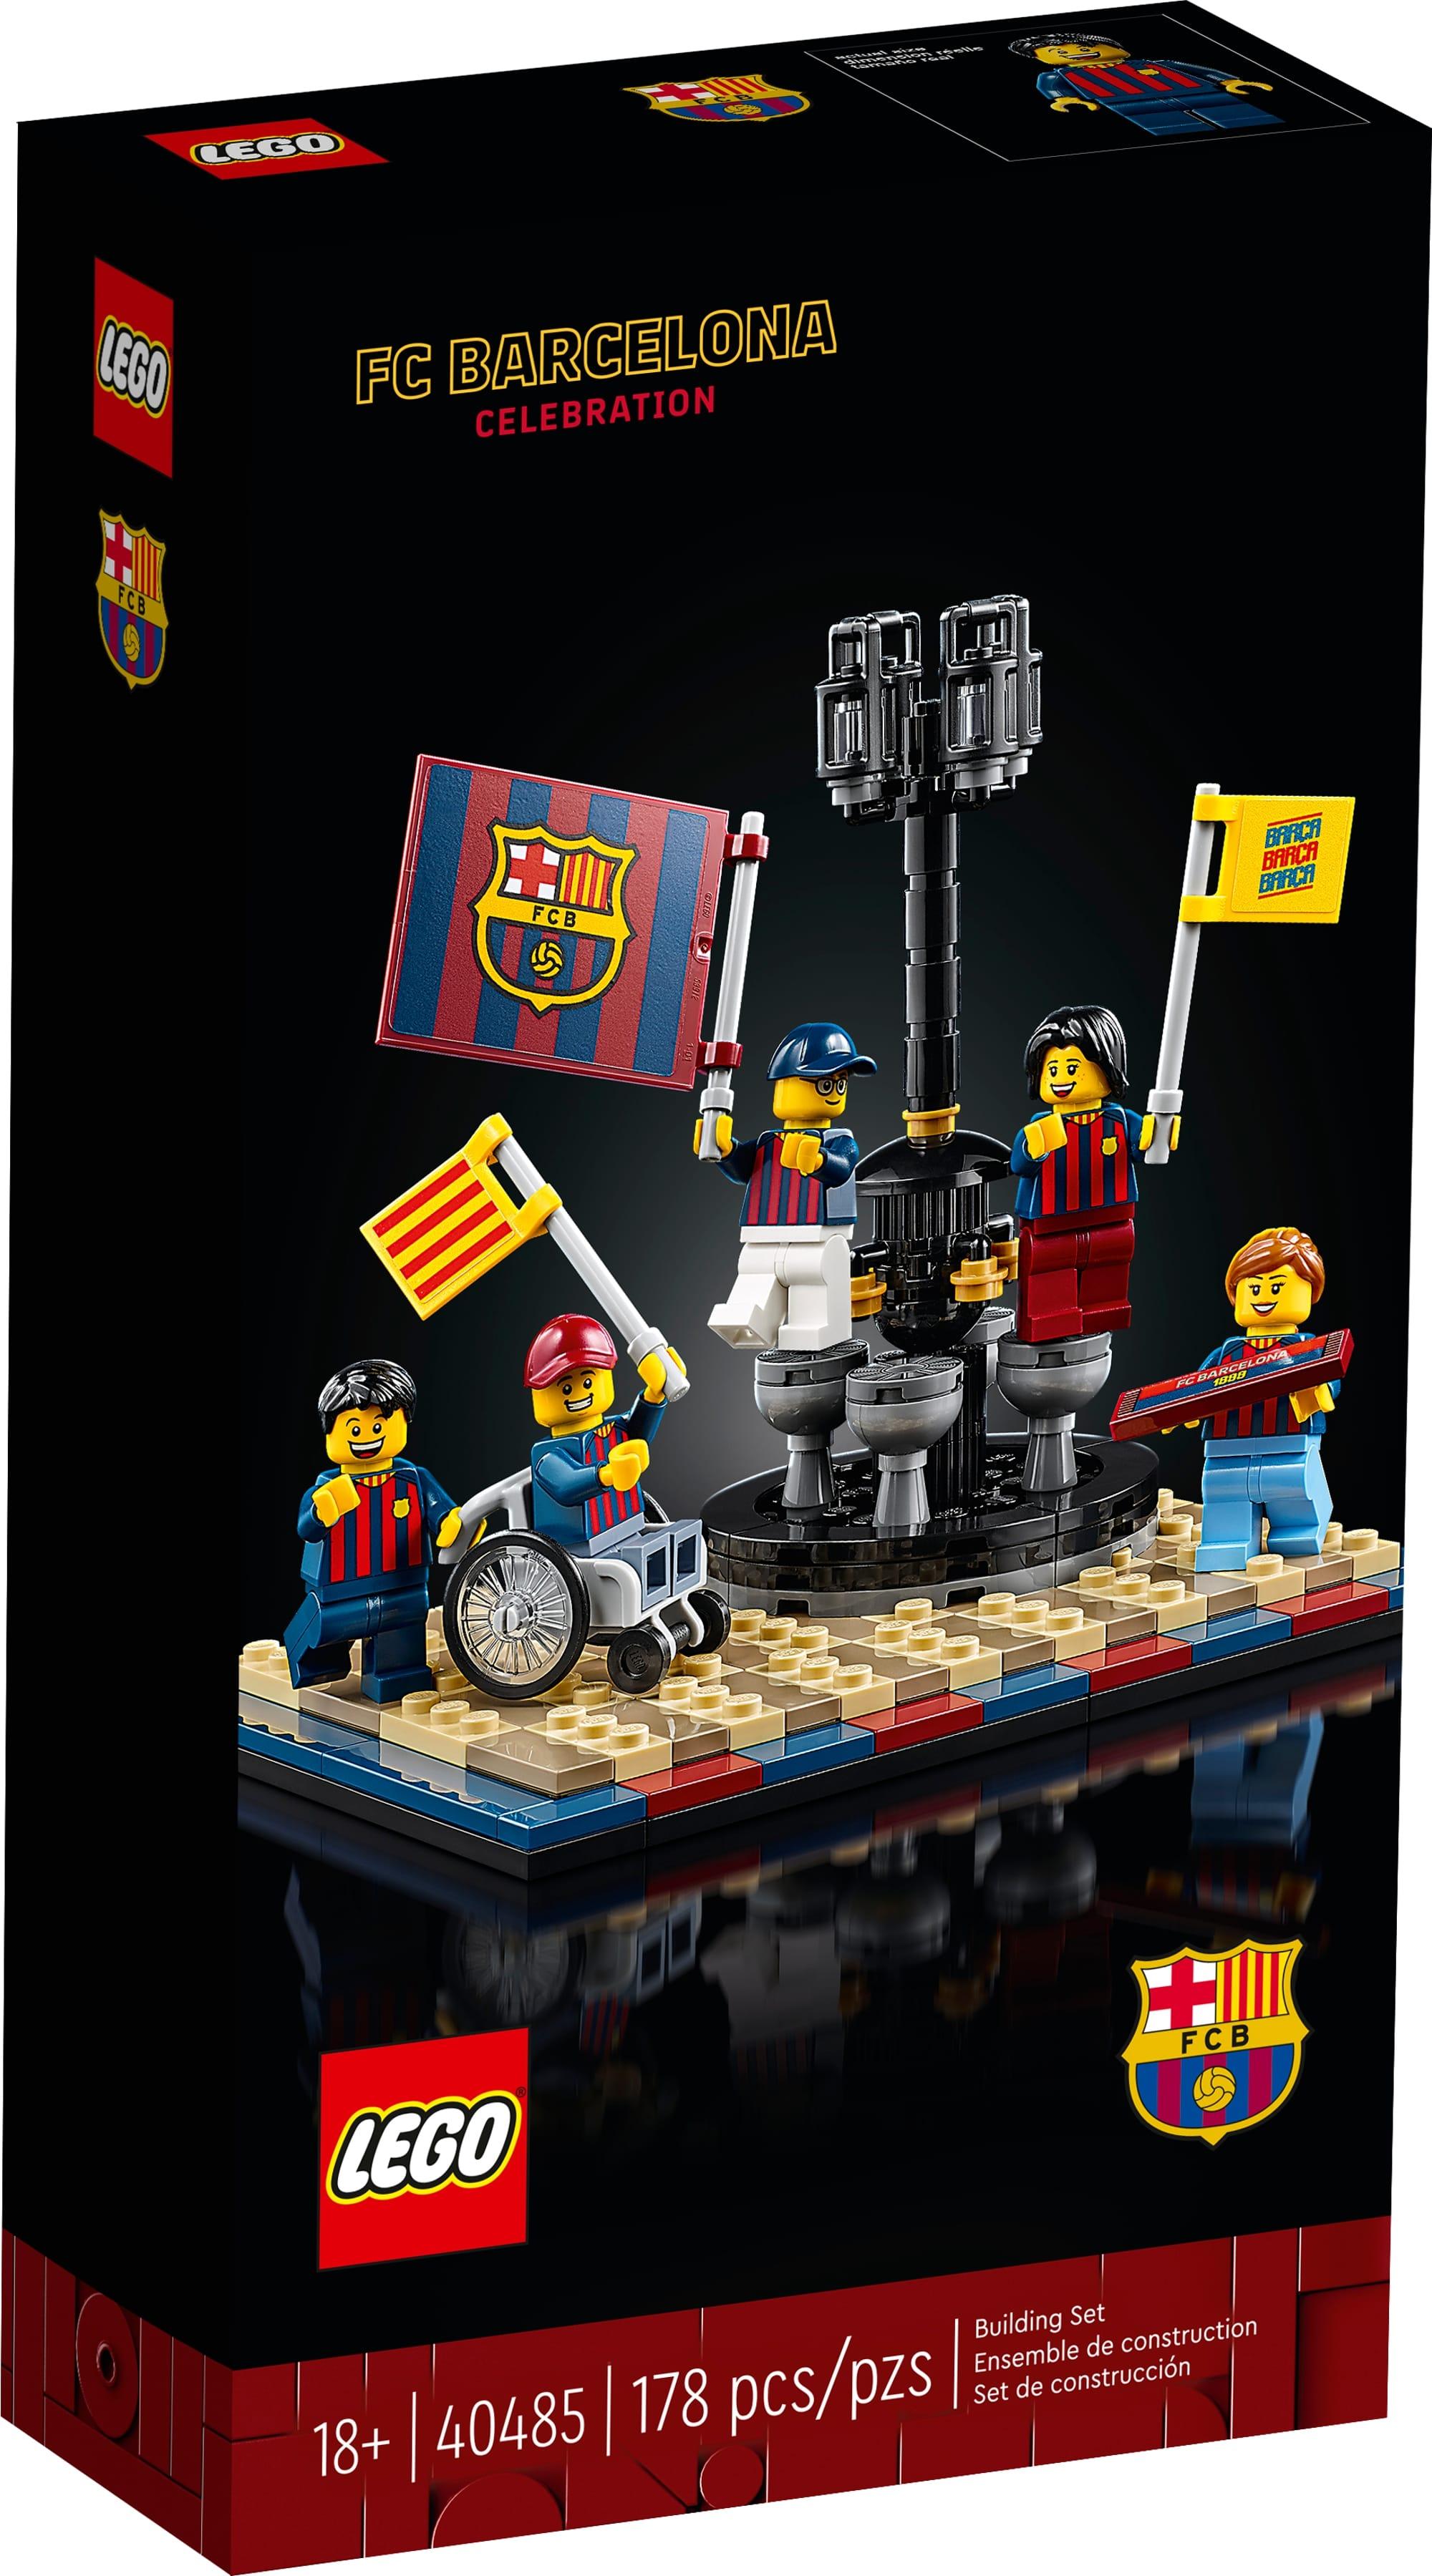 LEGO 40485 Fc Barcelona Celebration 2